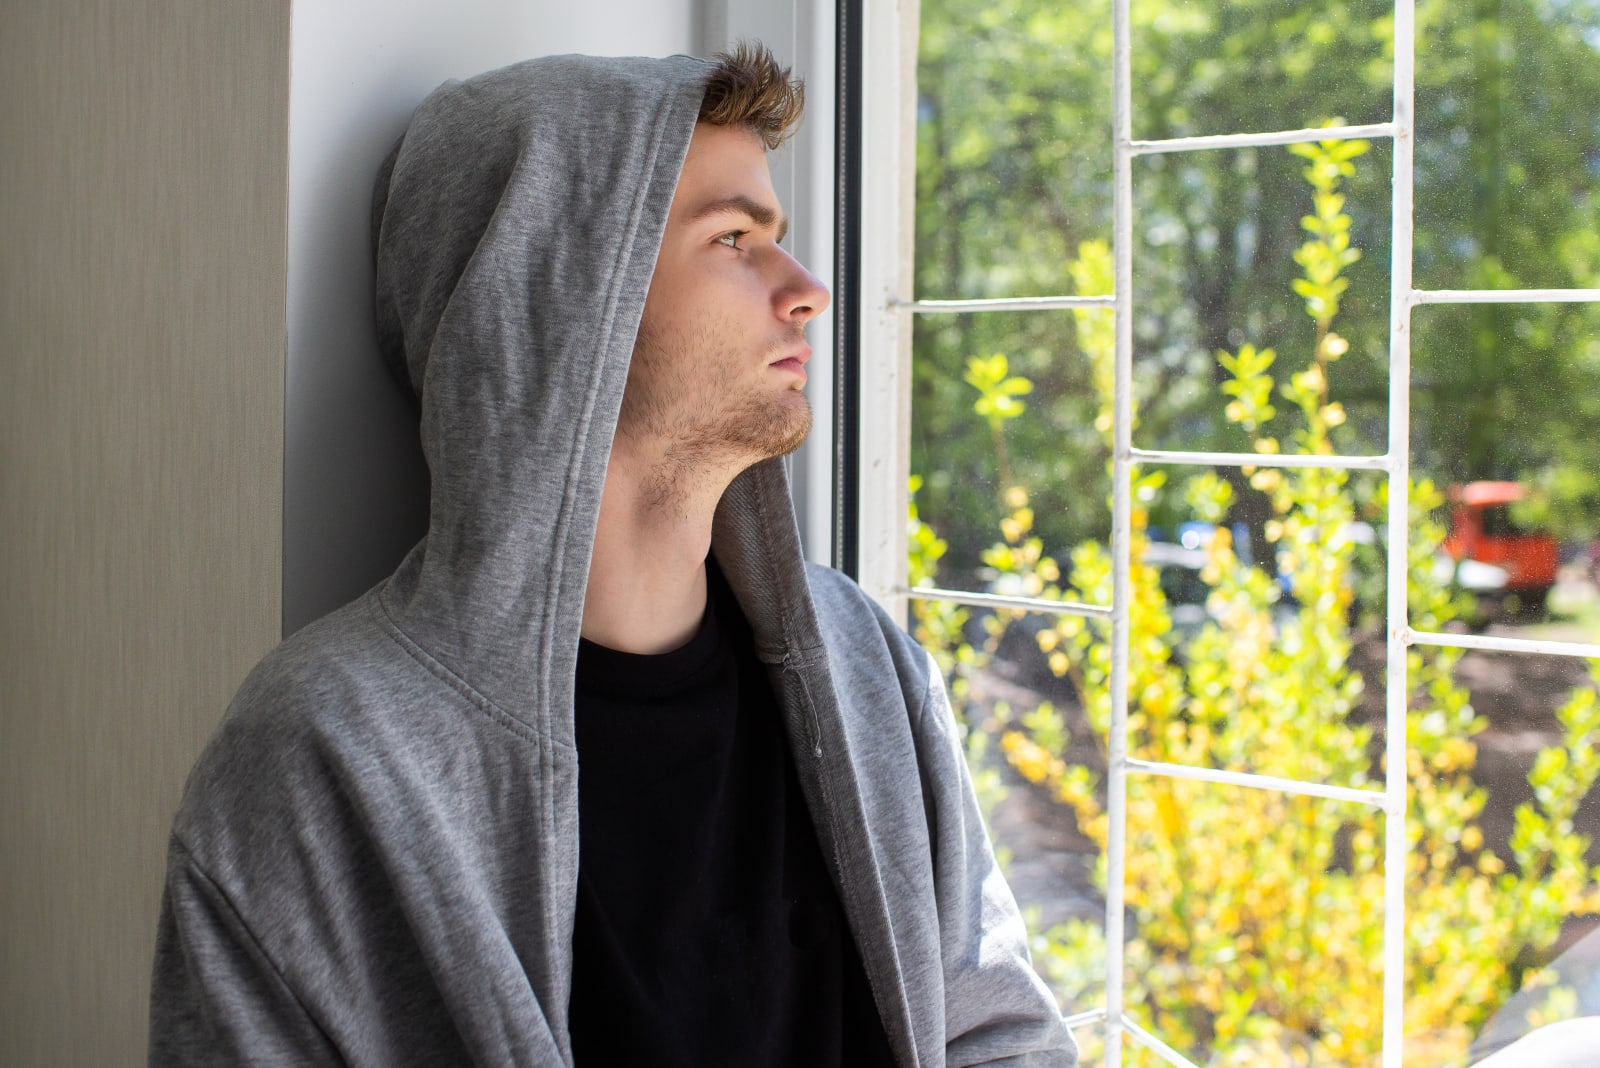 sad pensive young man